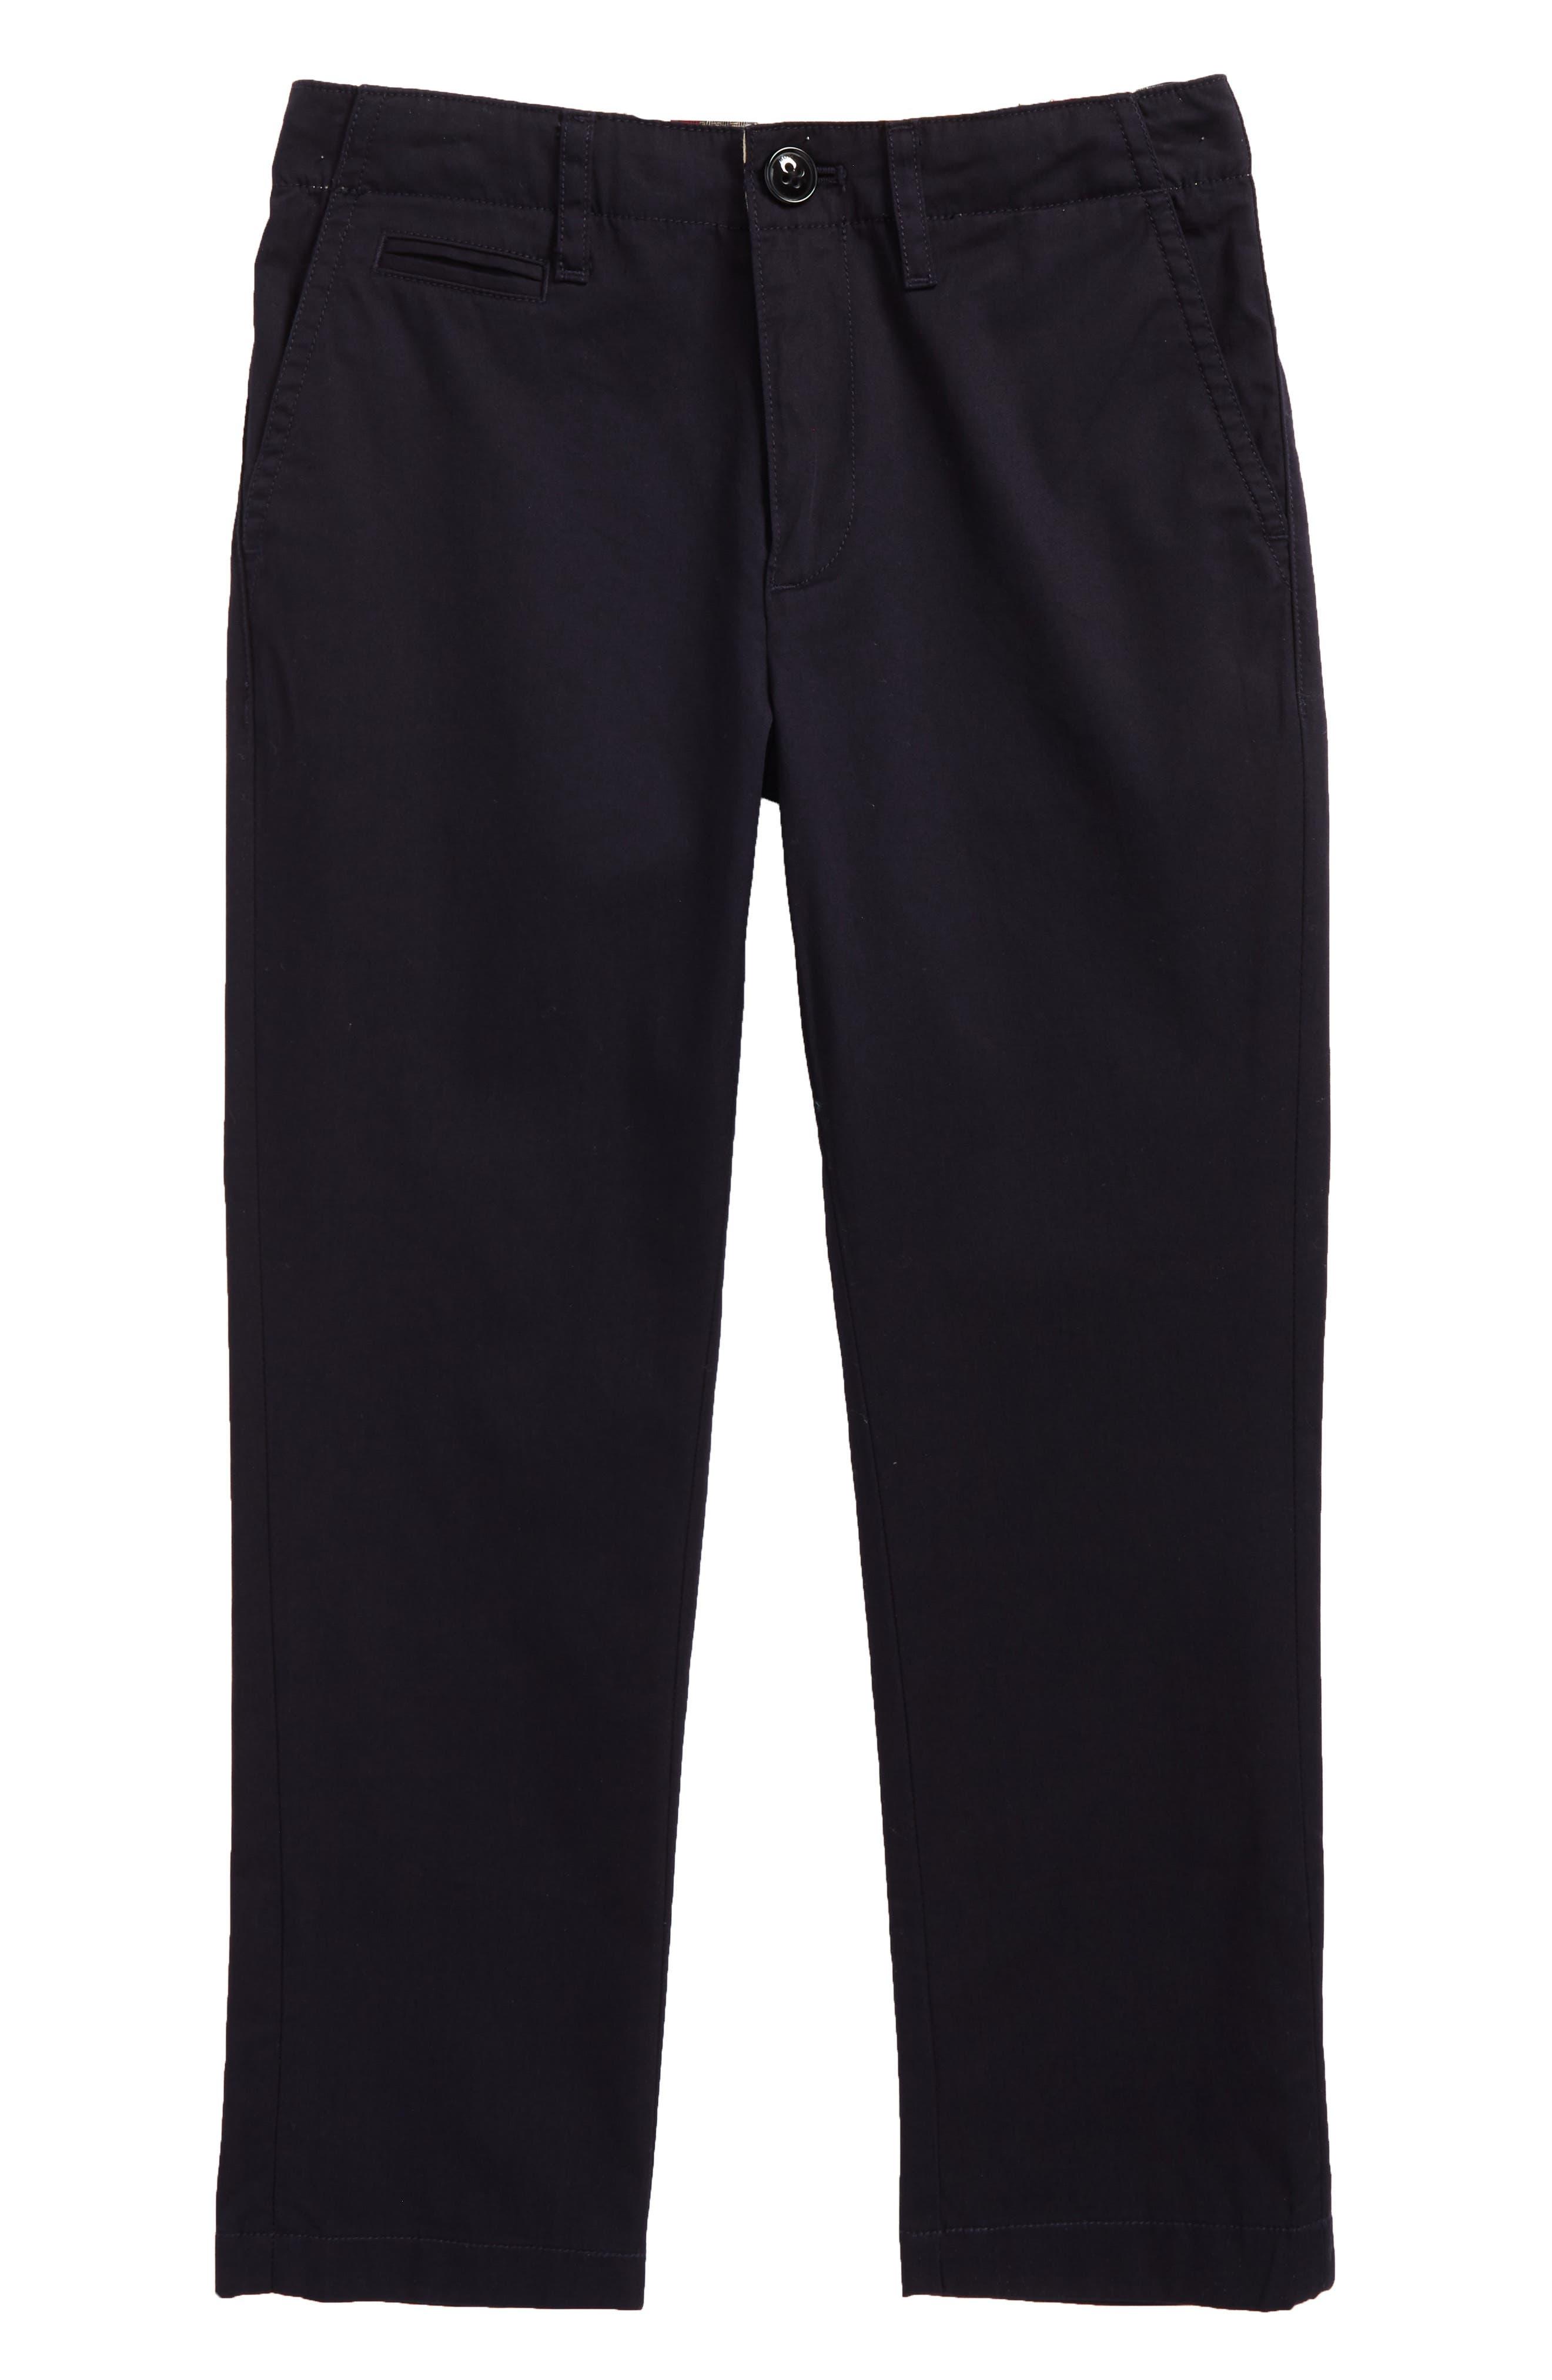 Burberry Teo Straight Leg Pants (Little Boys & Big Boys)